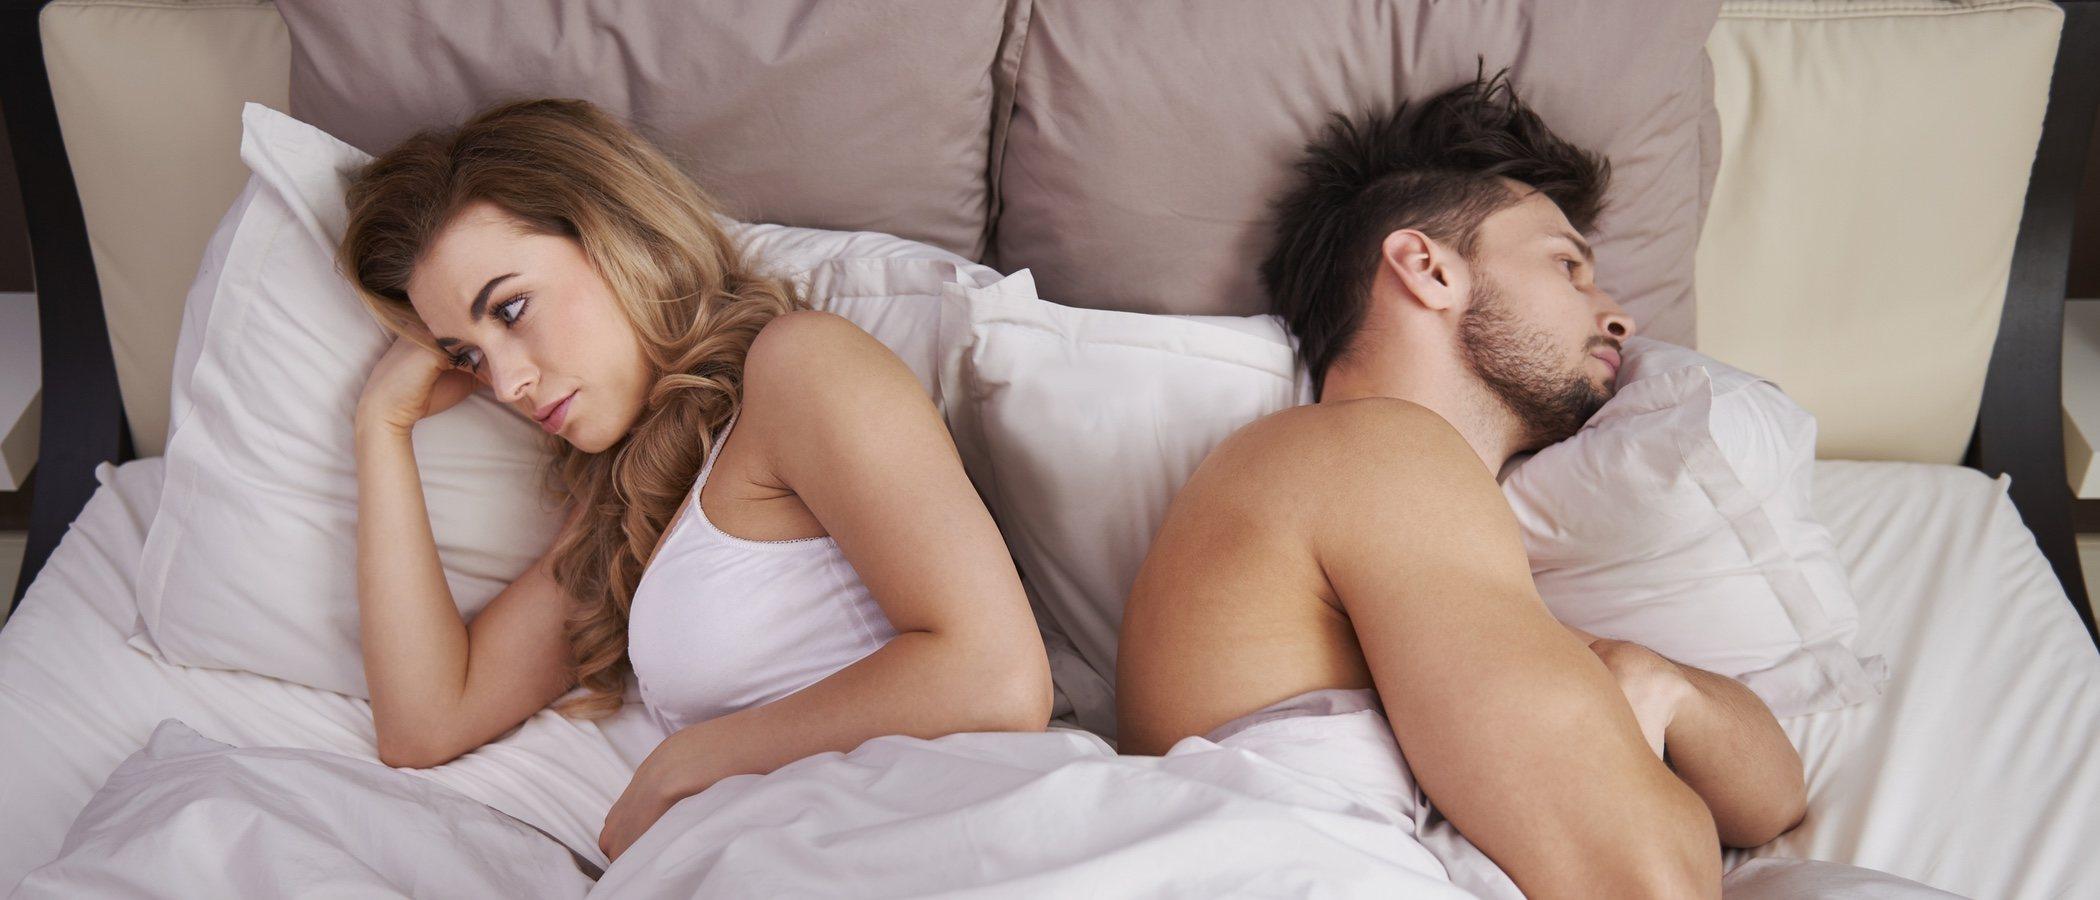 Horóscopo sexual marzo 2019: Capricornio